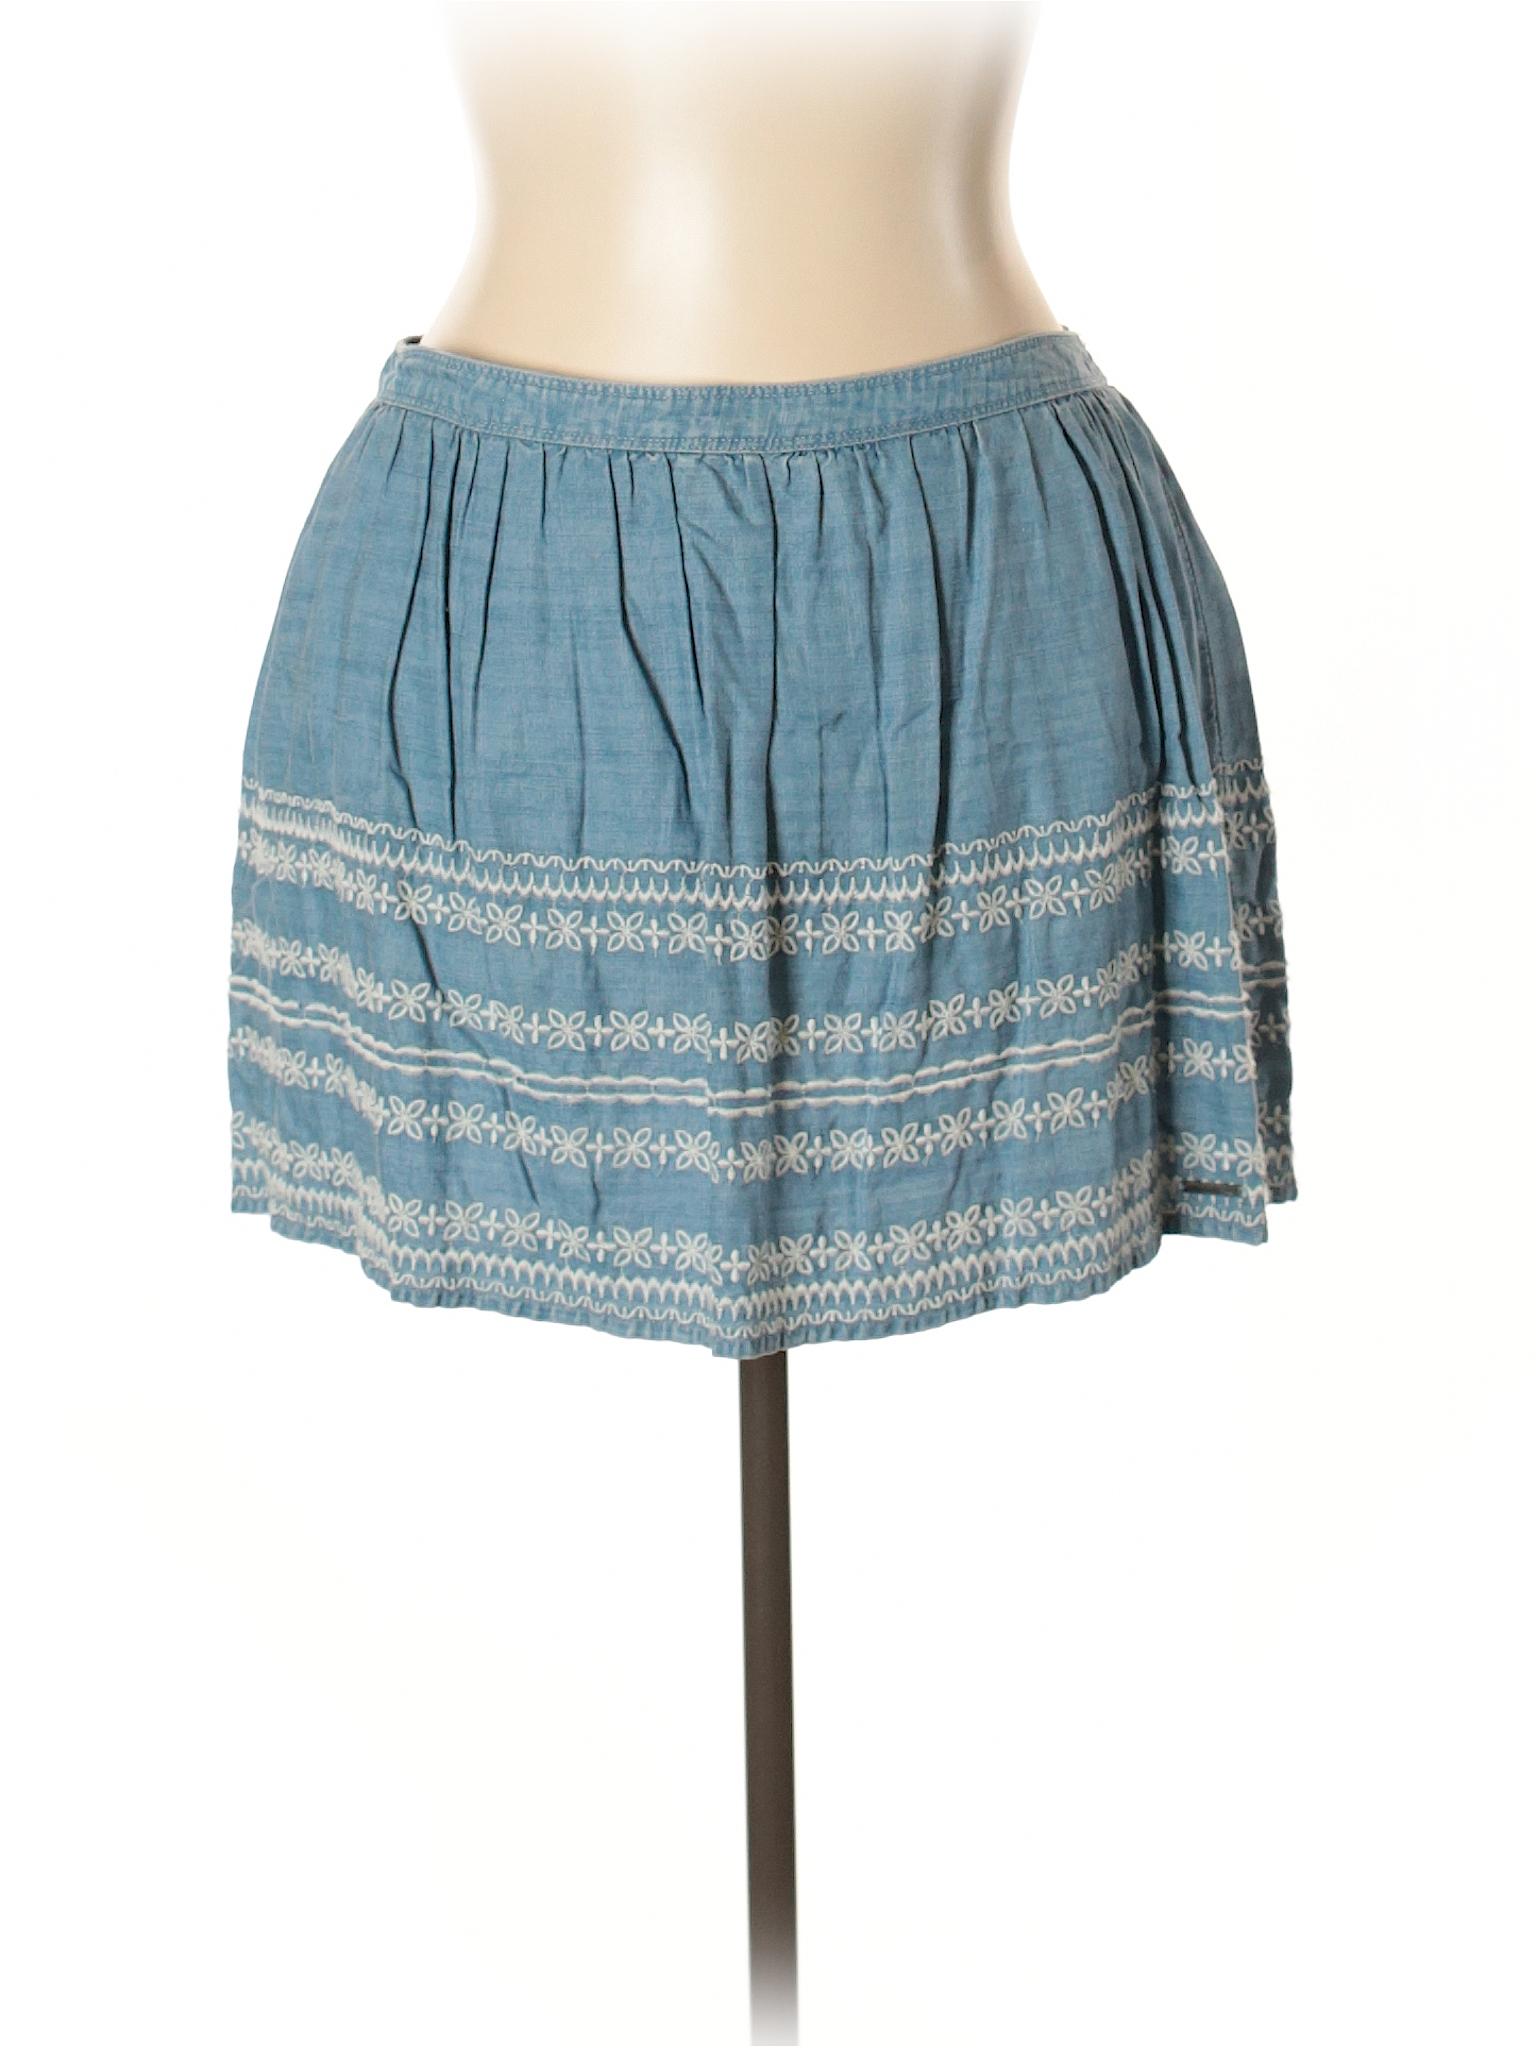 Skirt Boutique Casual Skirt Skirt Boutique Casual Boutique Casual Boutique tgywpAfq6v